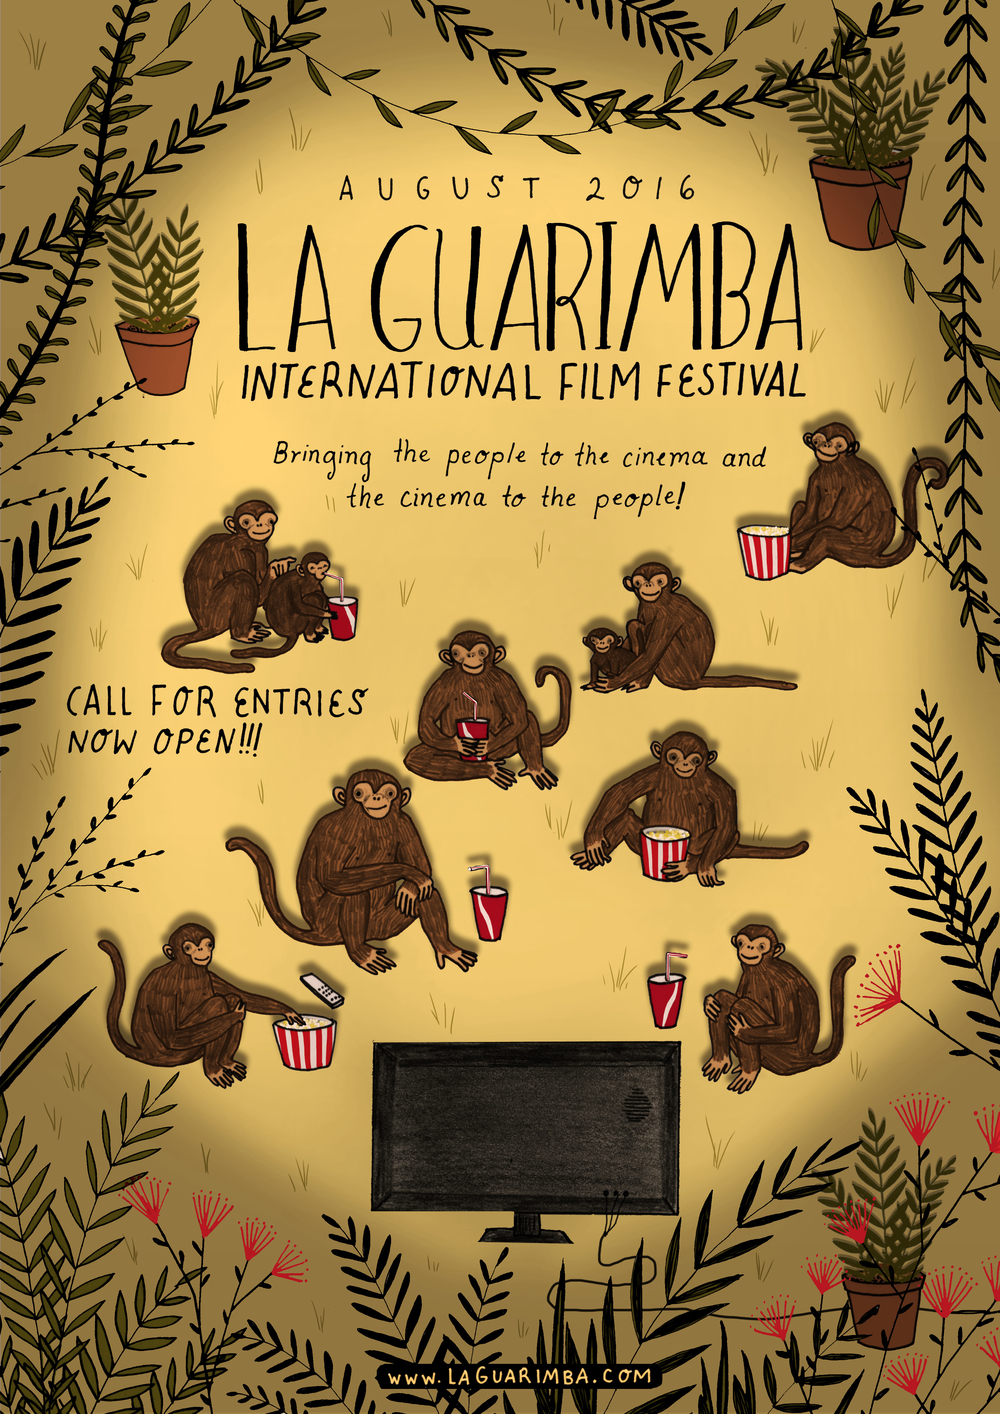 La Guarimba International Film Festival 2016